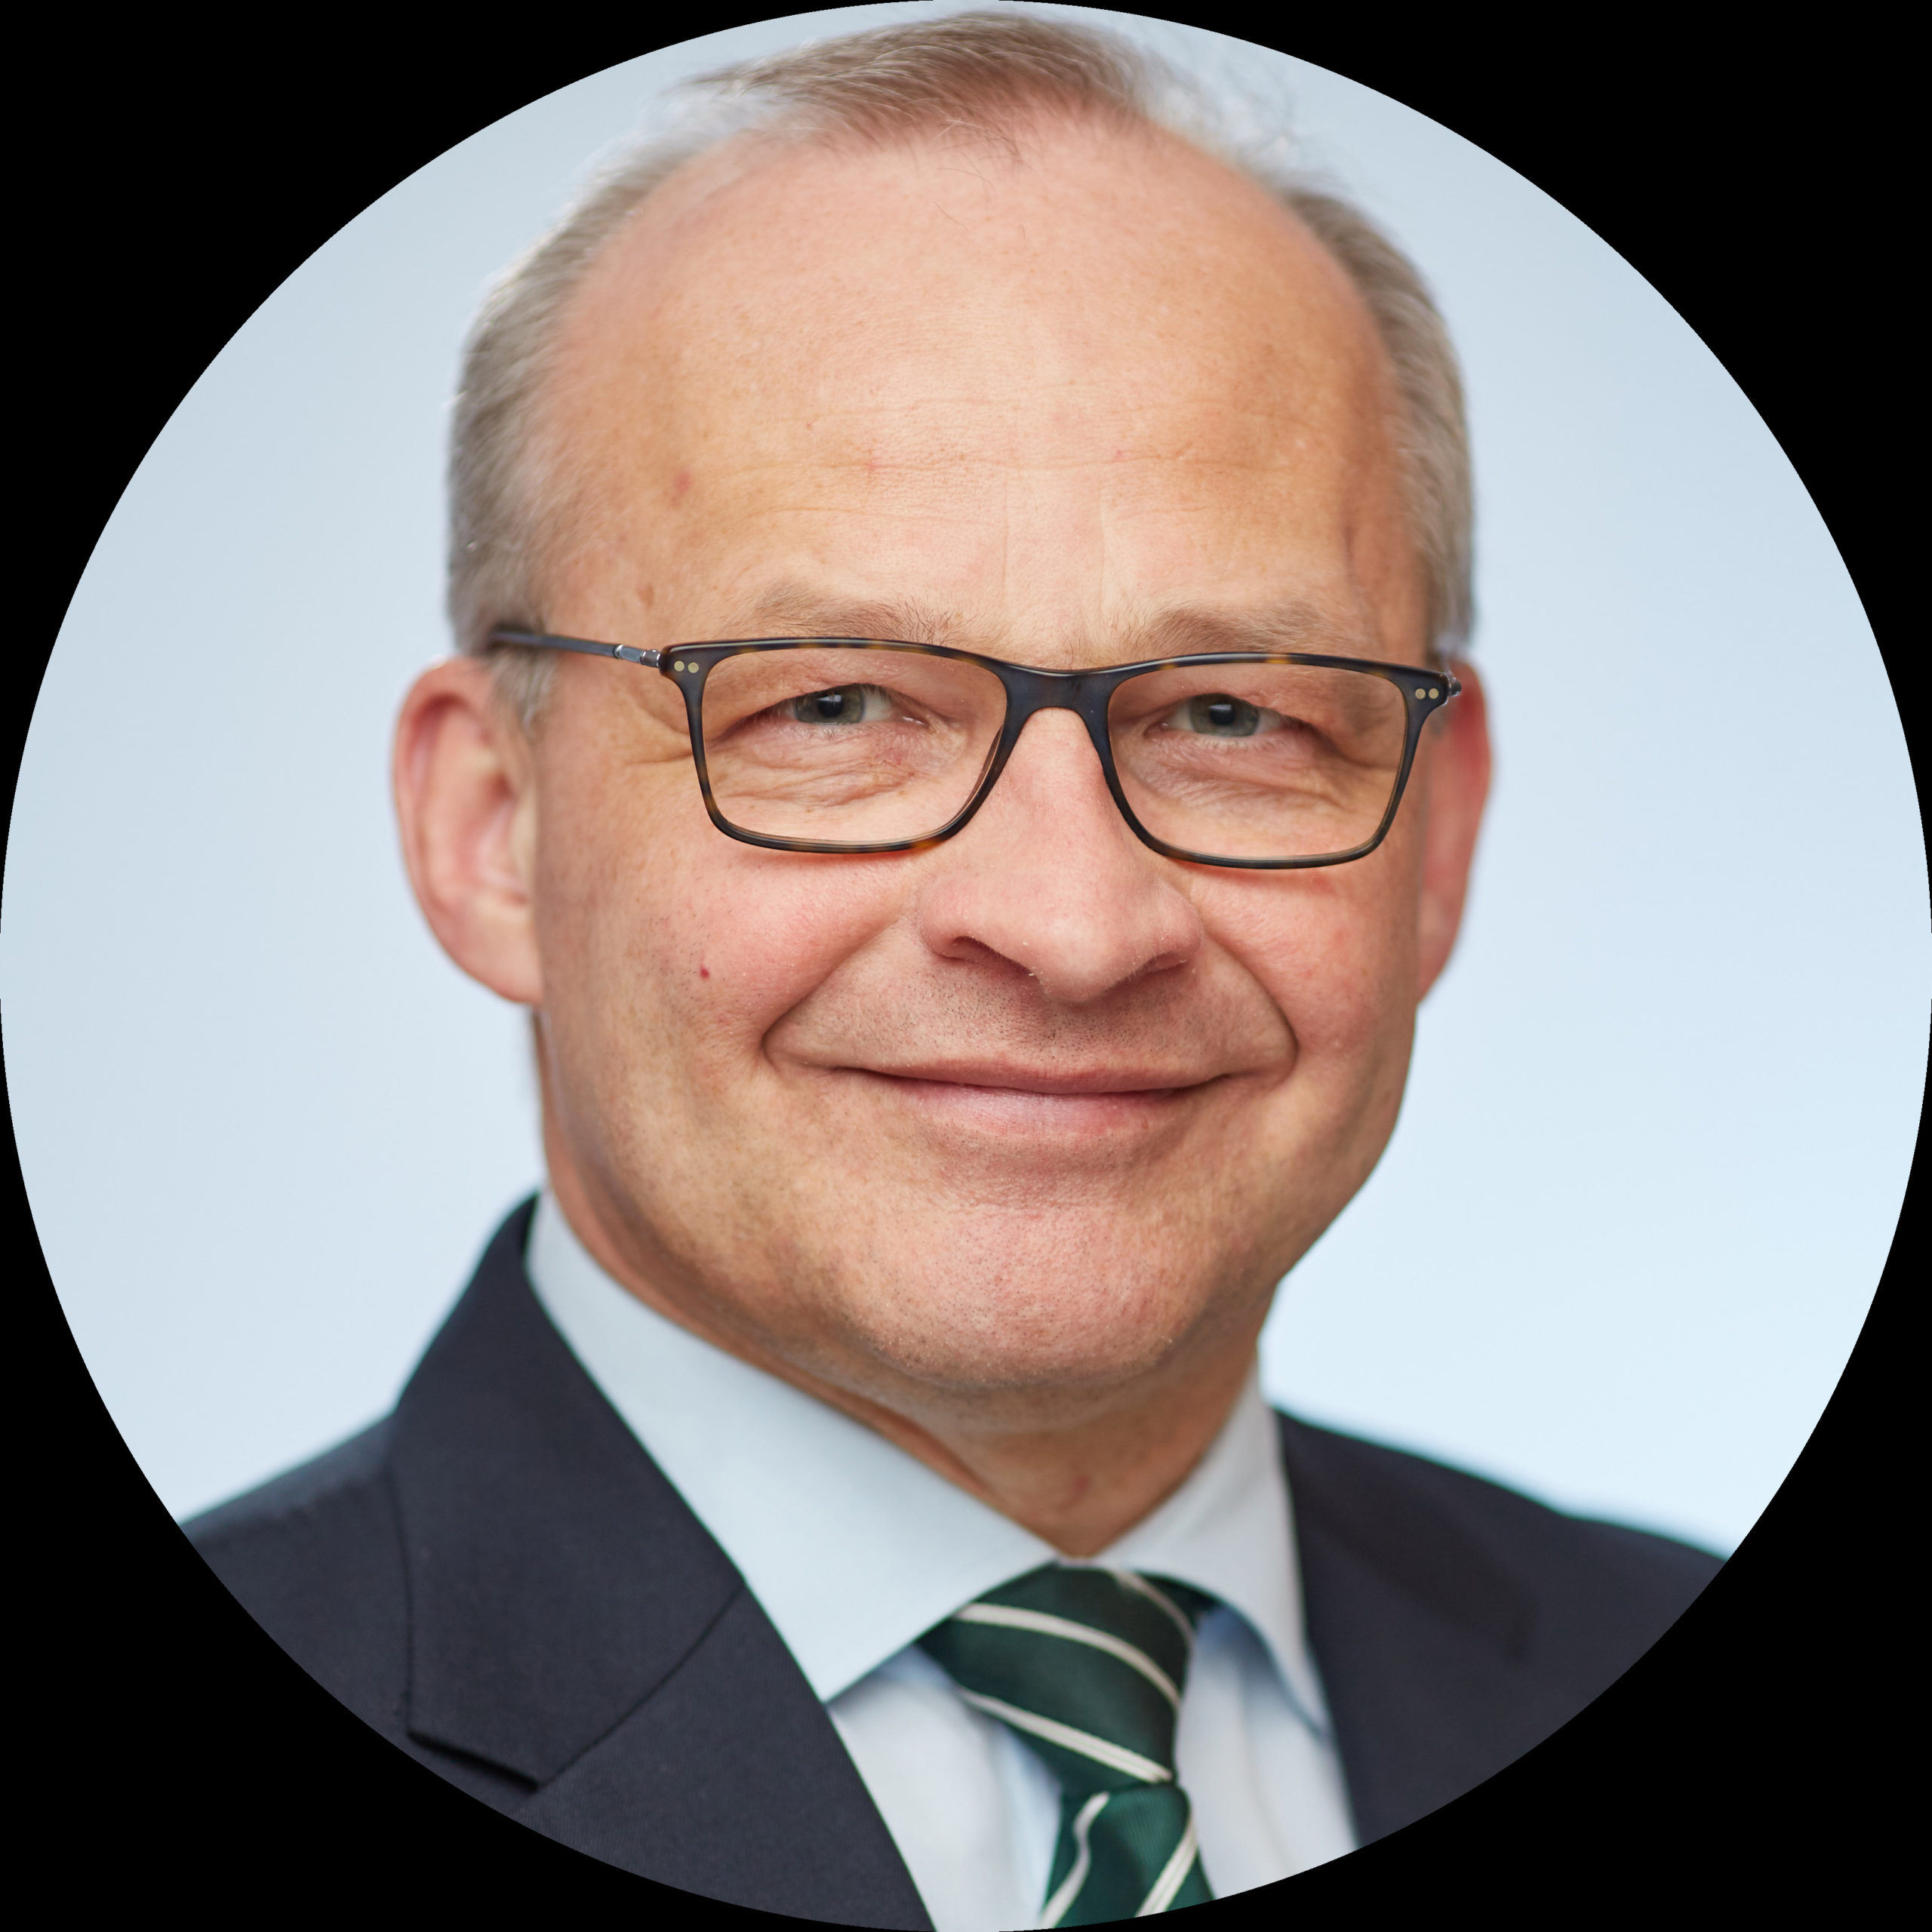 Portraitfoto von Dr. Christian Schmidt